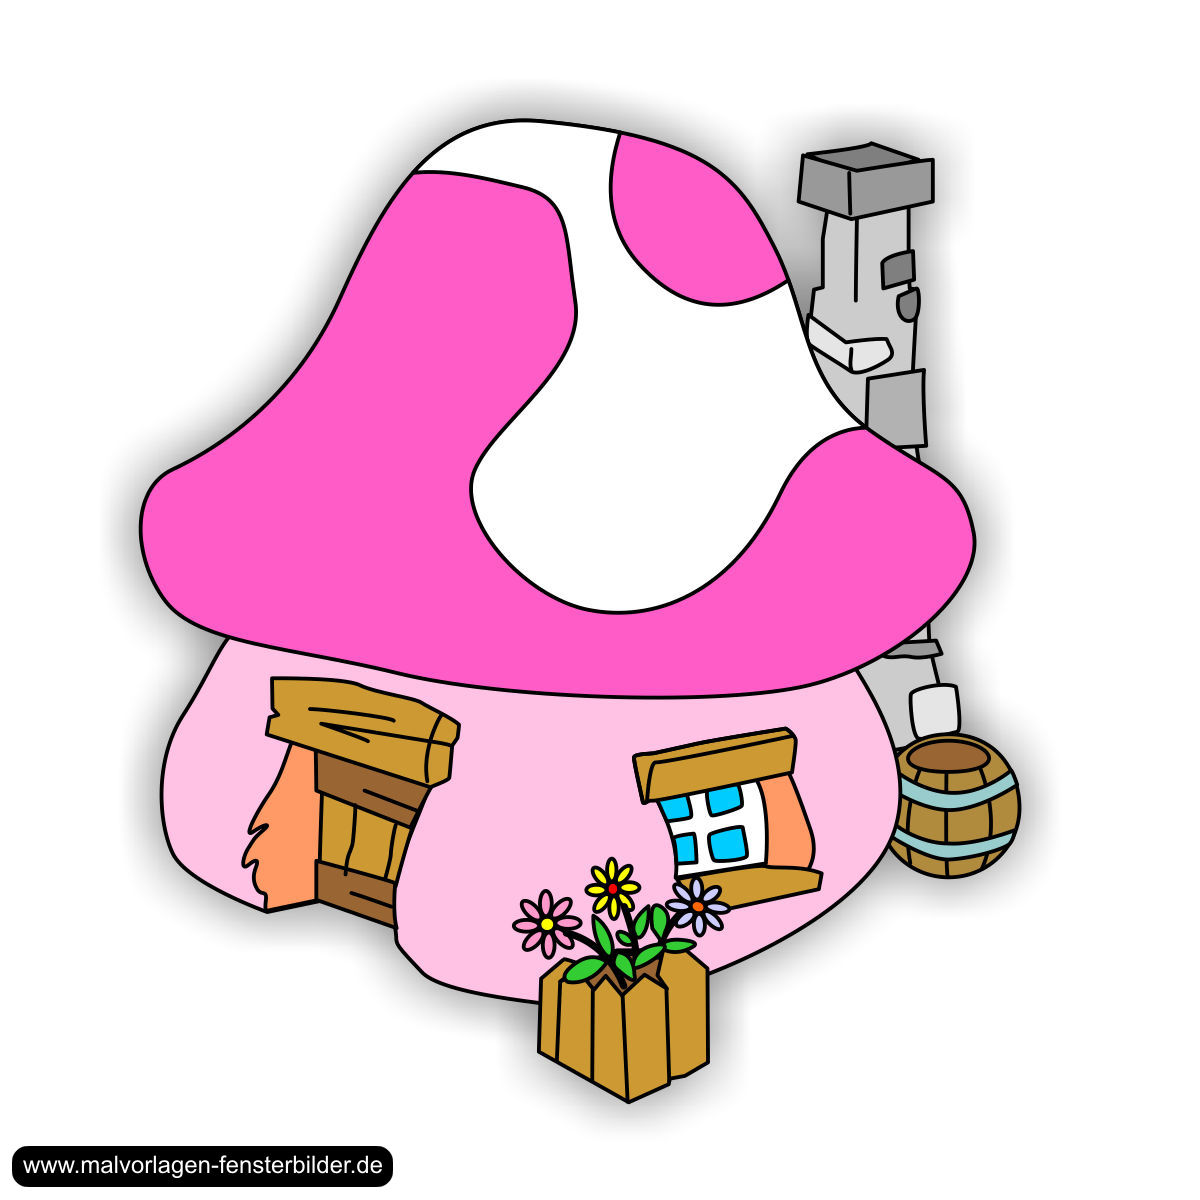 Mushroom clipart smurf Pinterest Smurfs jpg The Schlumpfhaus